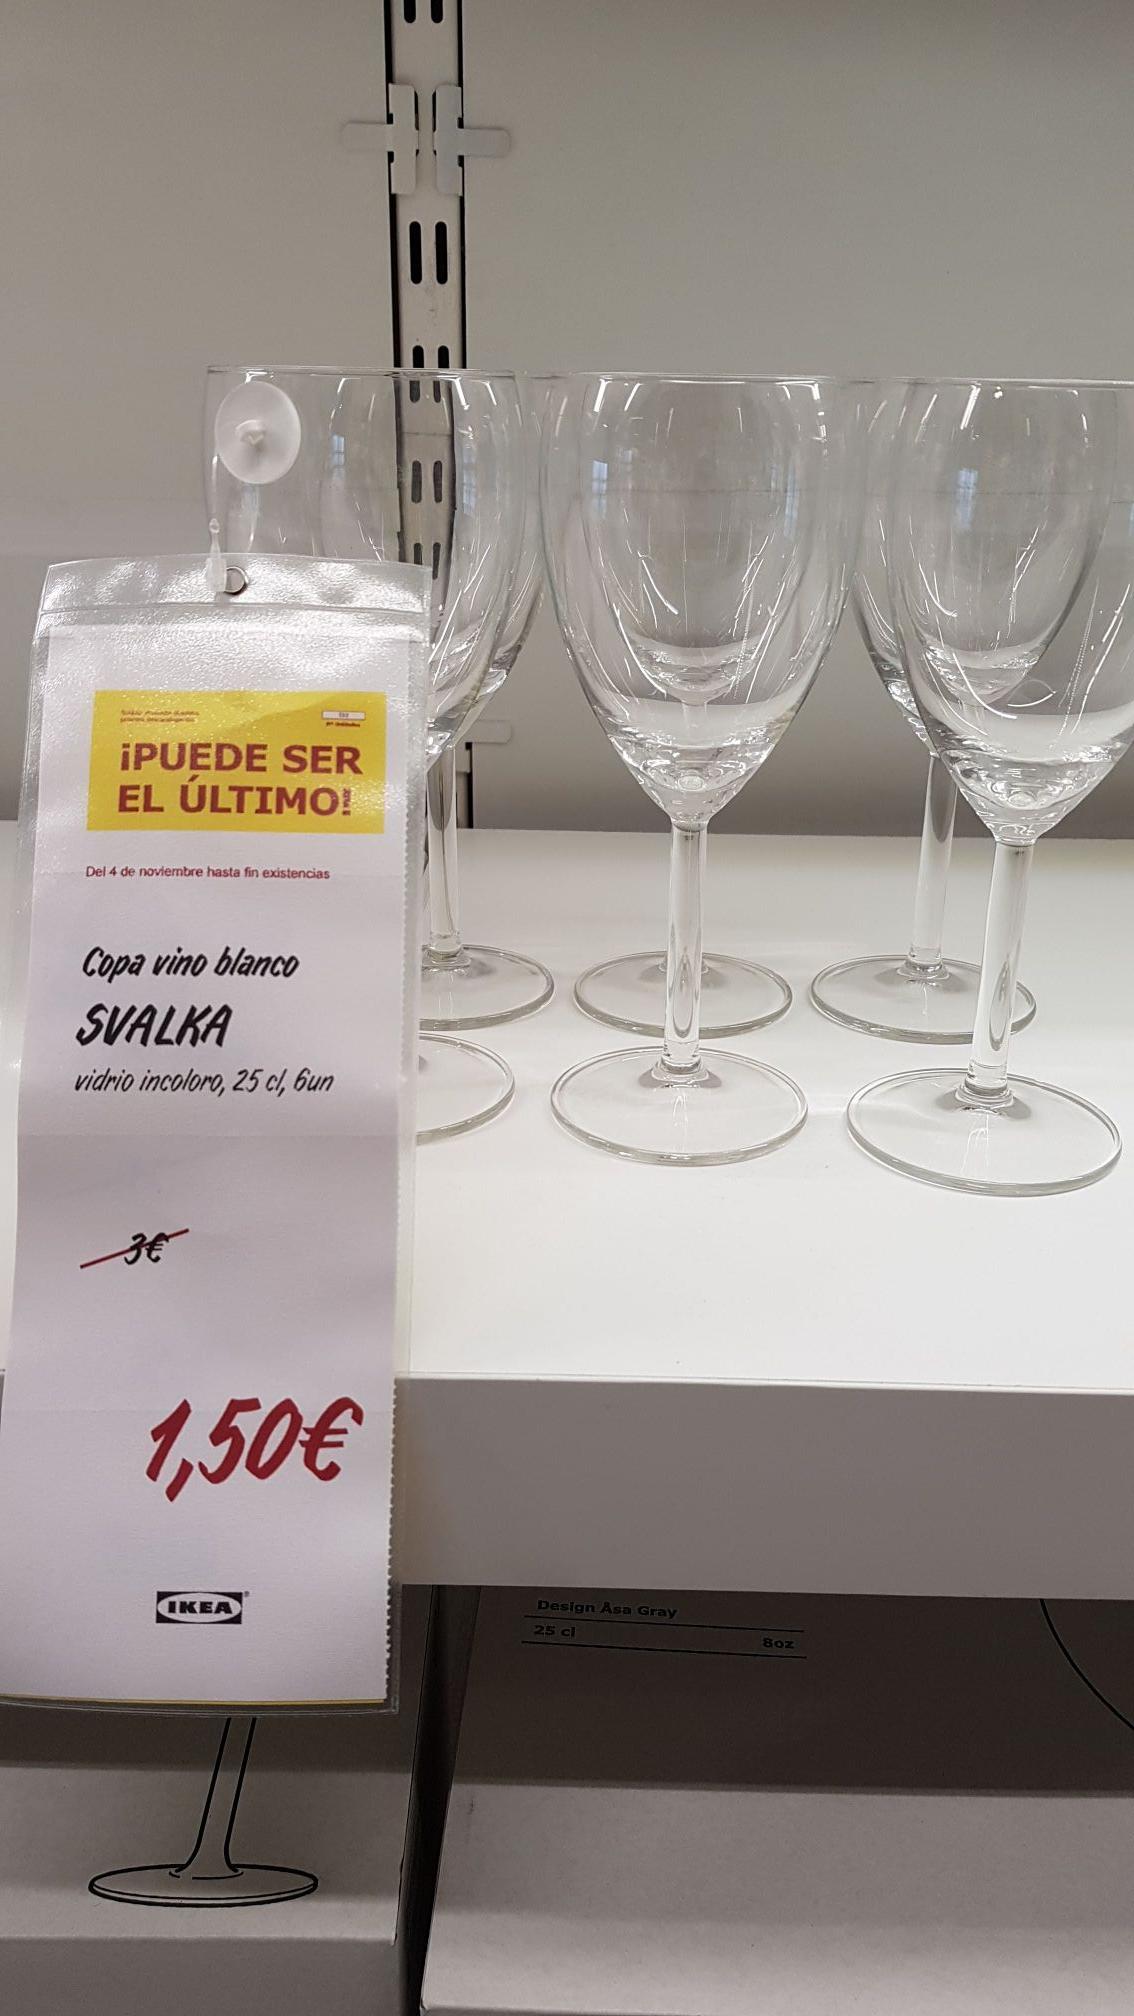 6 copas de vino blanco al 50% en ikea